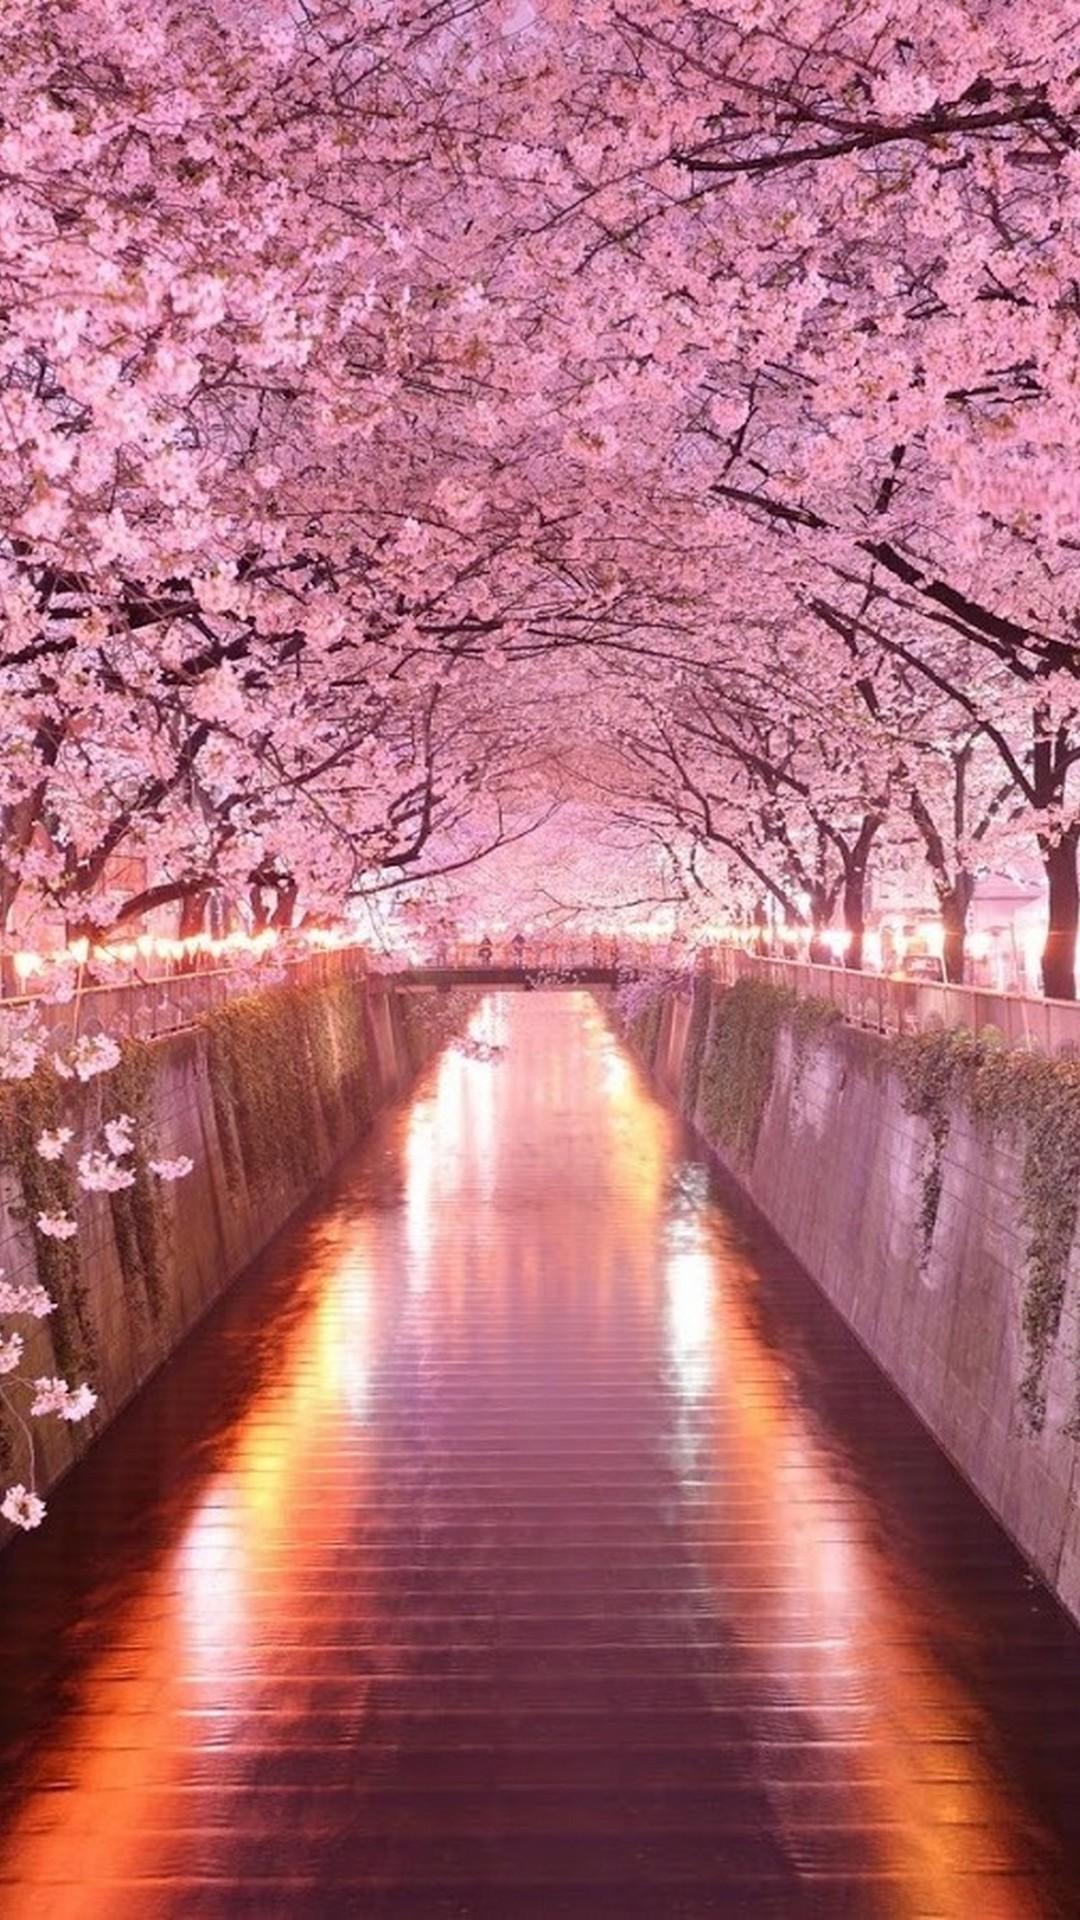 Cute Pink Wallpaper For Phone Pink Flower Iphone Wallpaper Hd 2018 Cute Screensavers